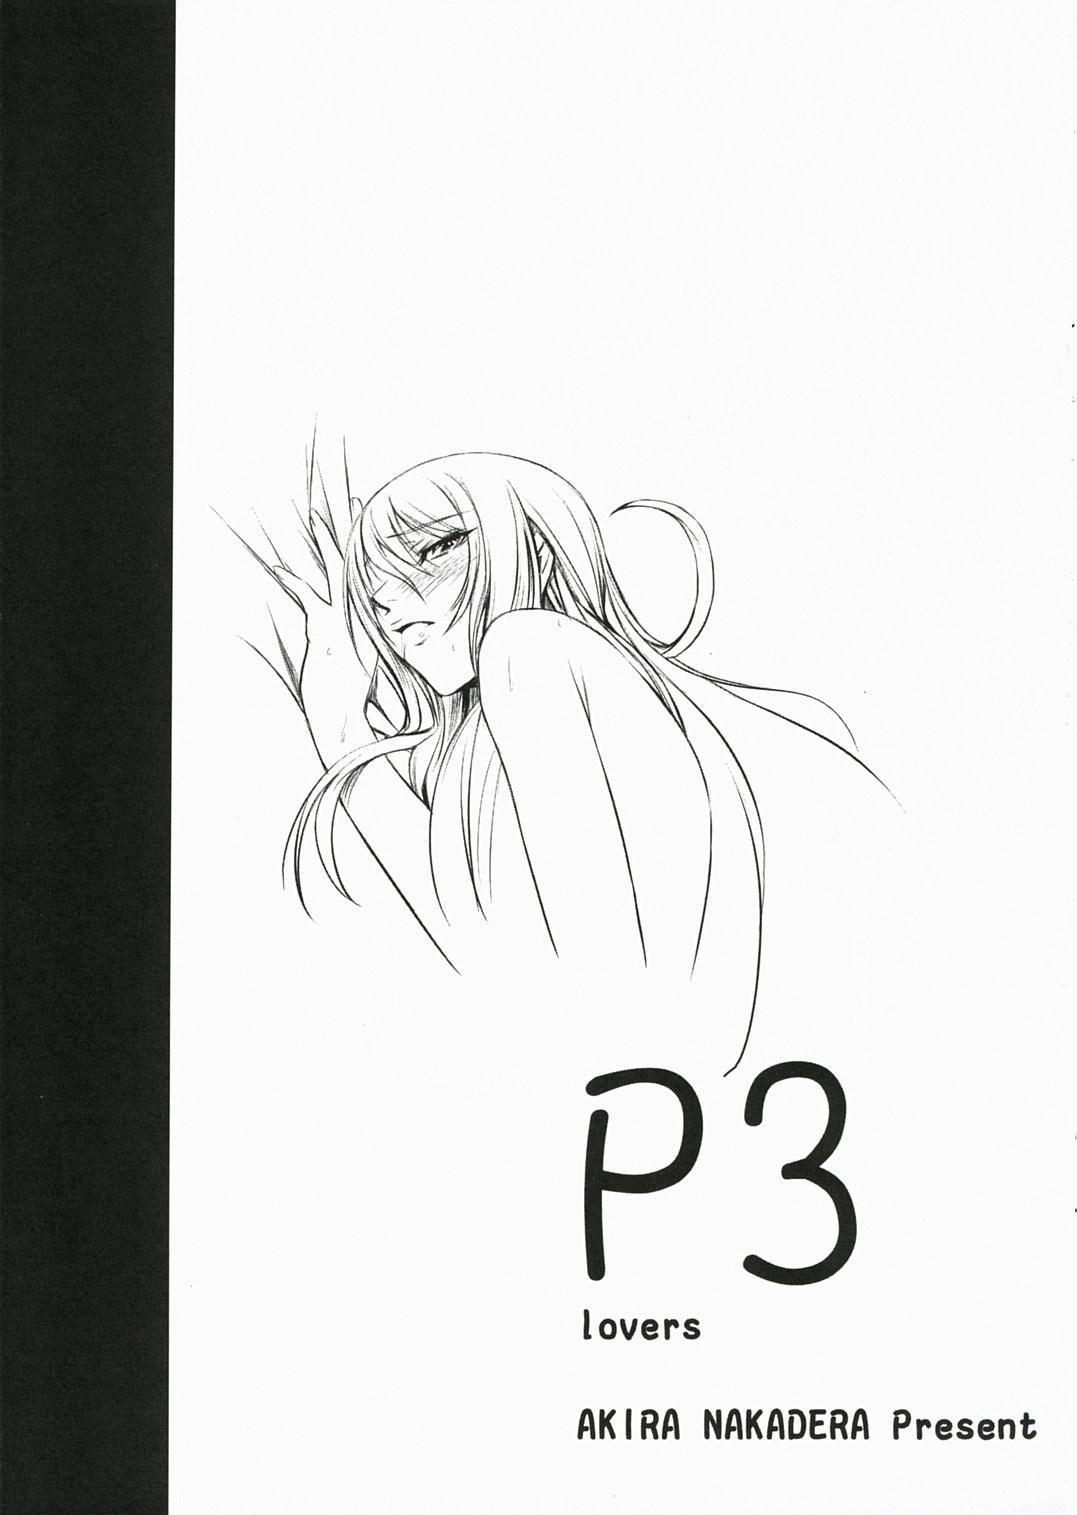 P3 lovers 1